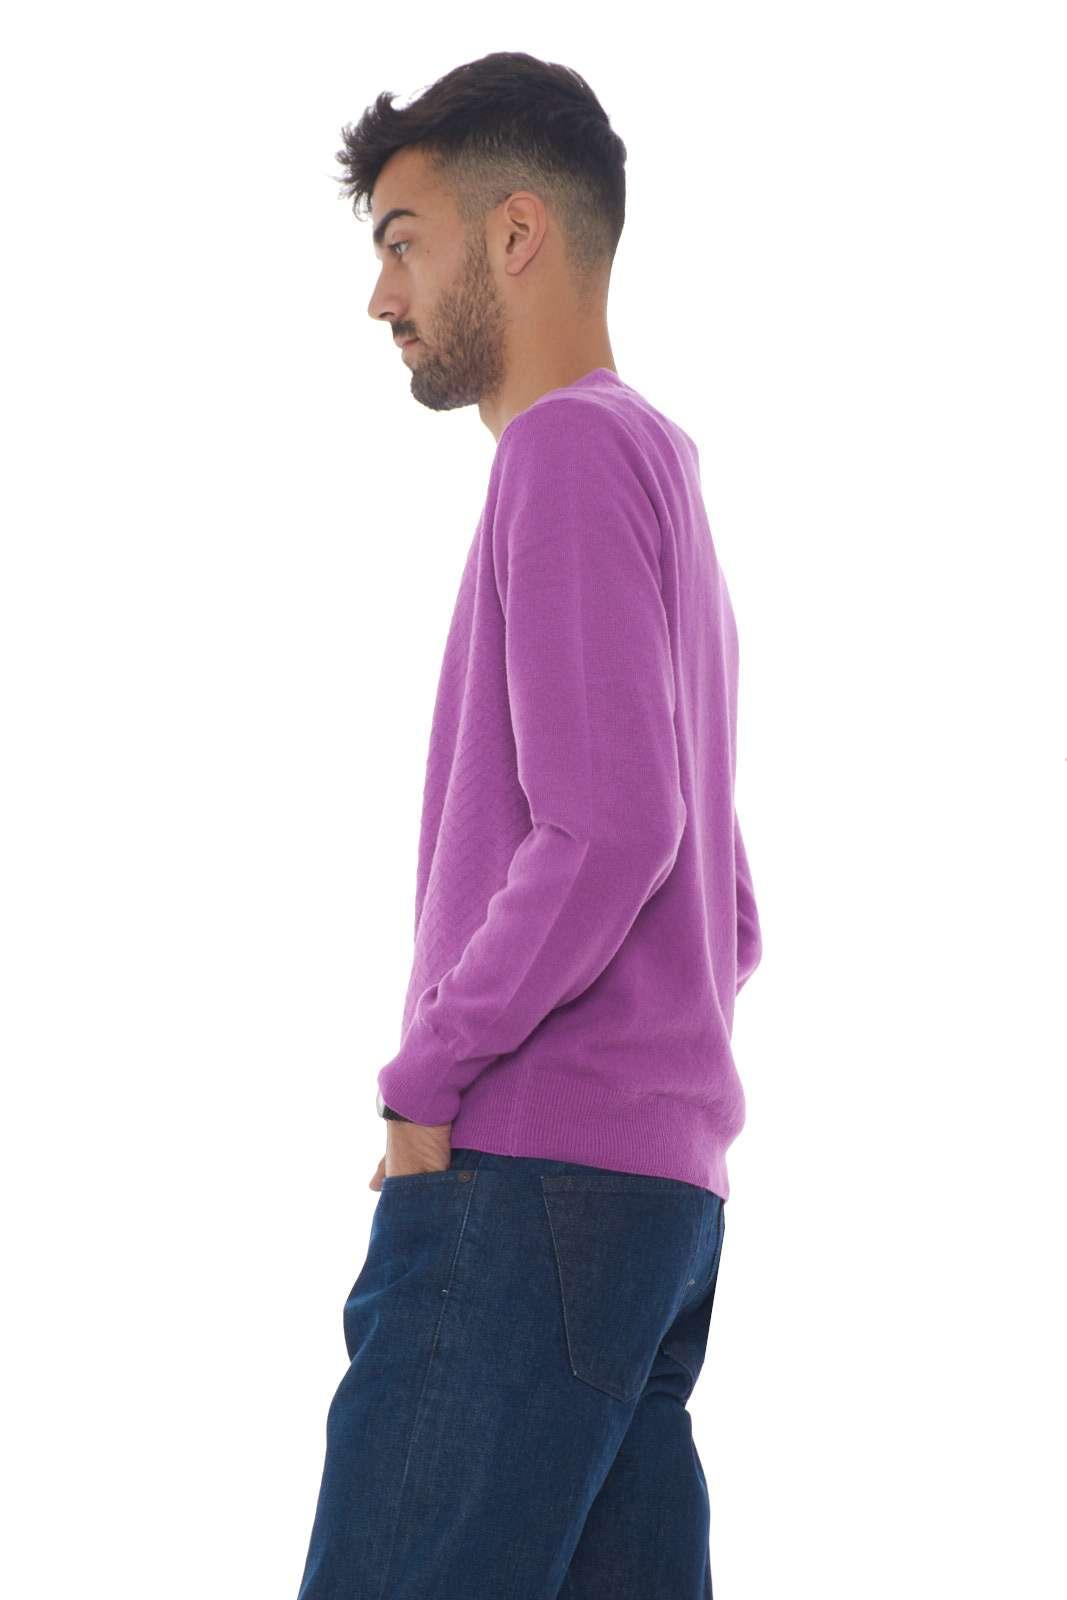 https://www.parmax.com/media/catalog/product/a/i/AI-outlet_parmax-maglia-uomo-Acquapura-0011-B.jpg